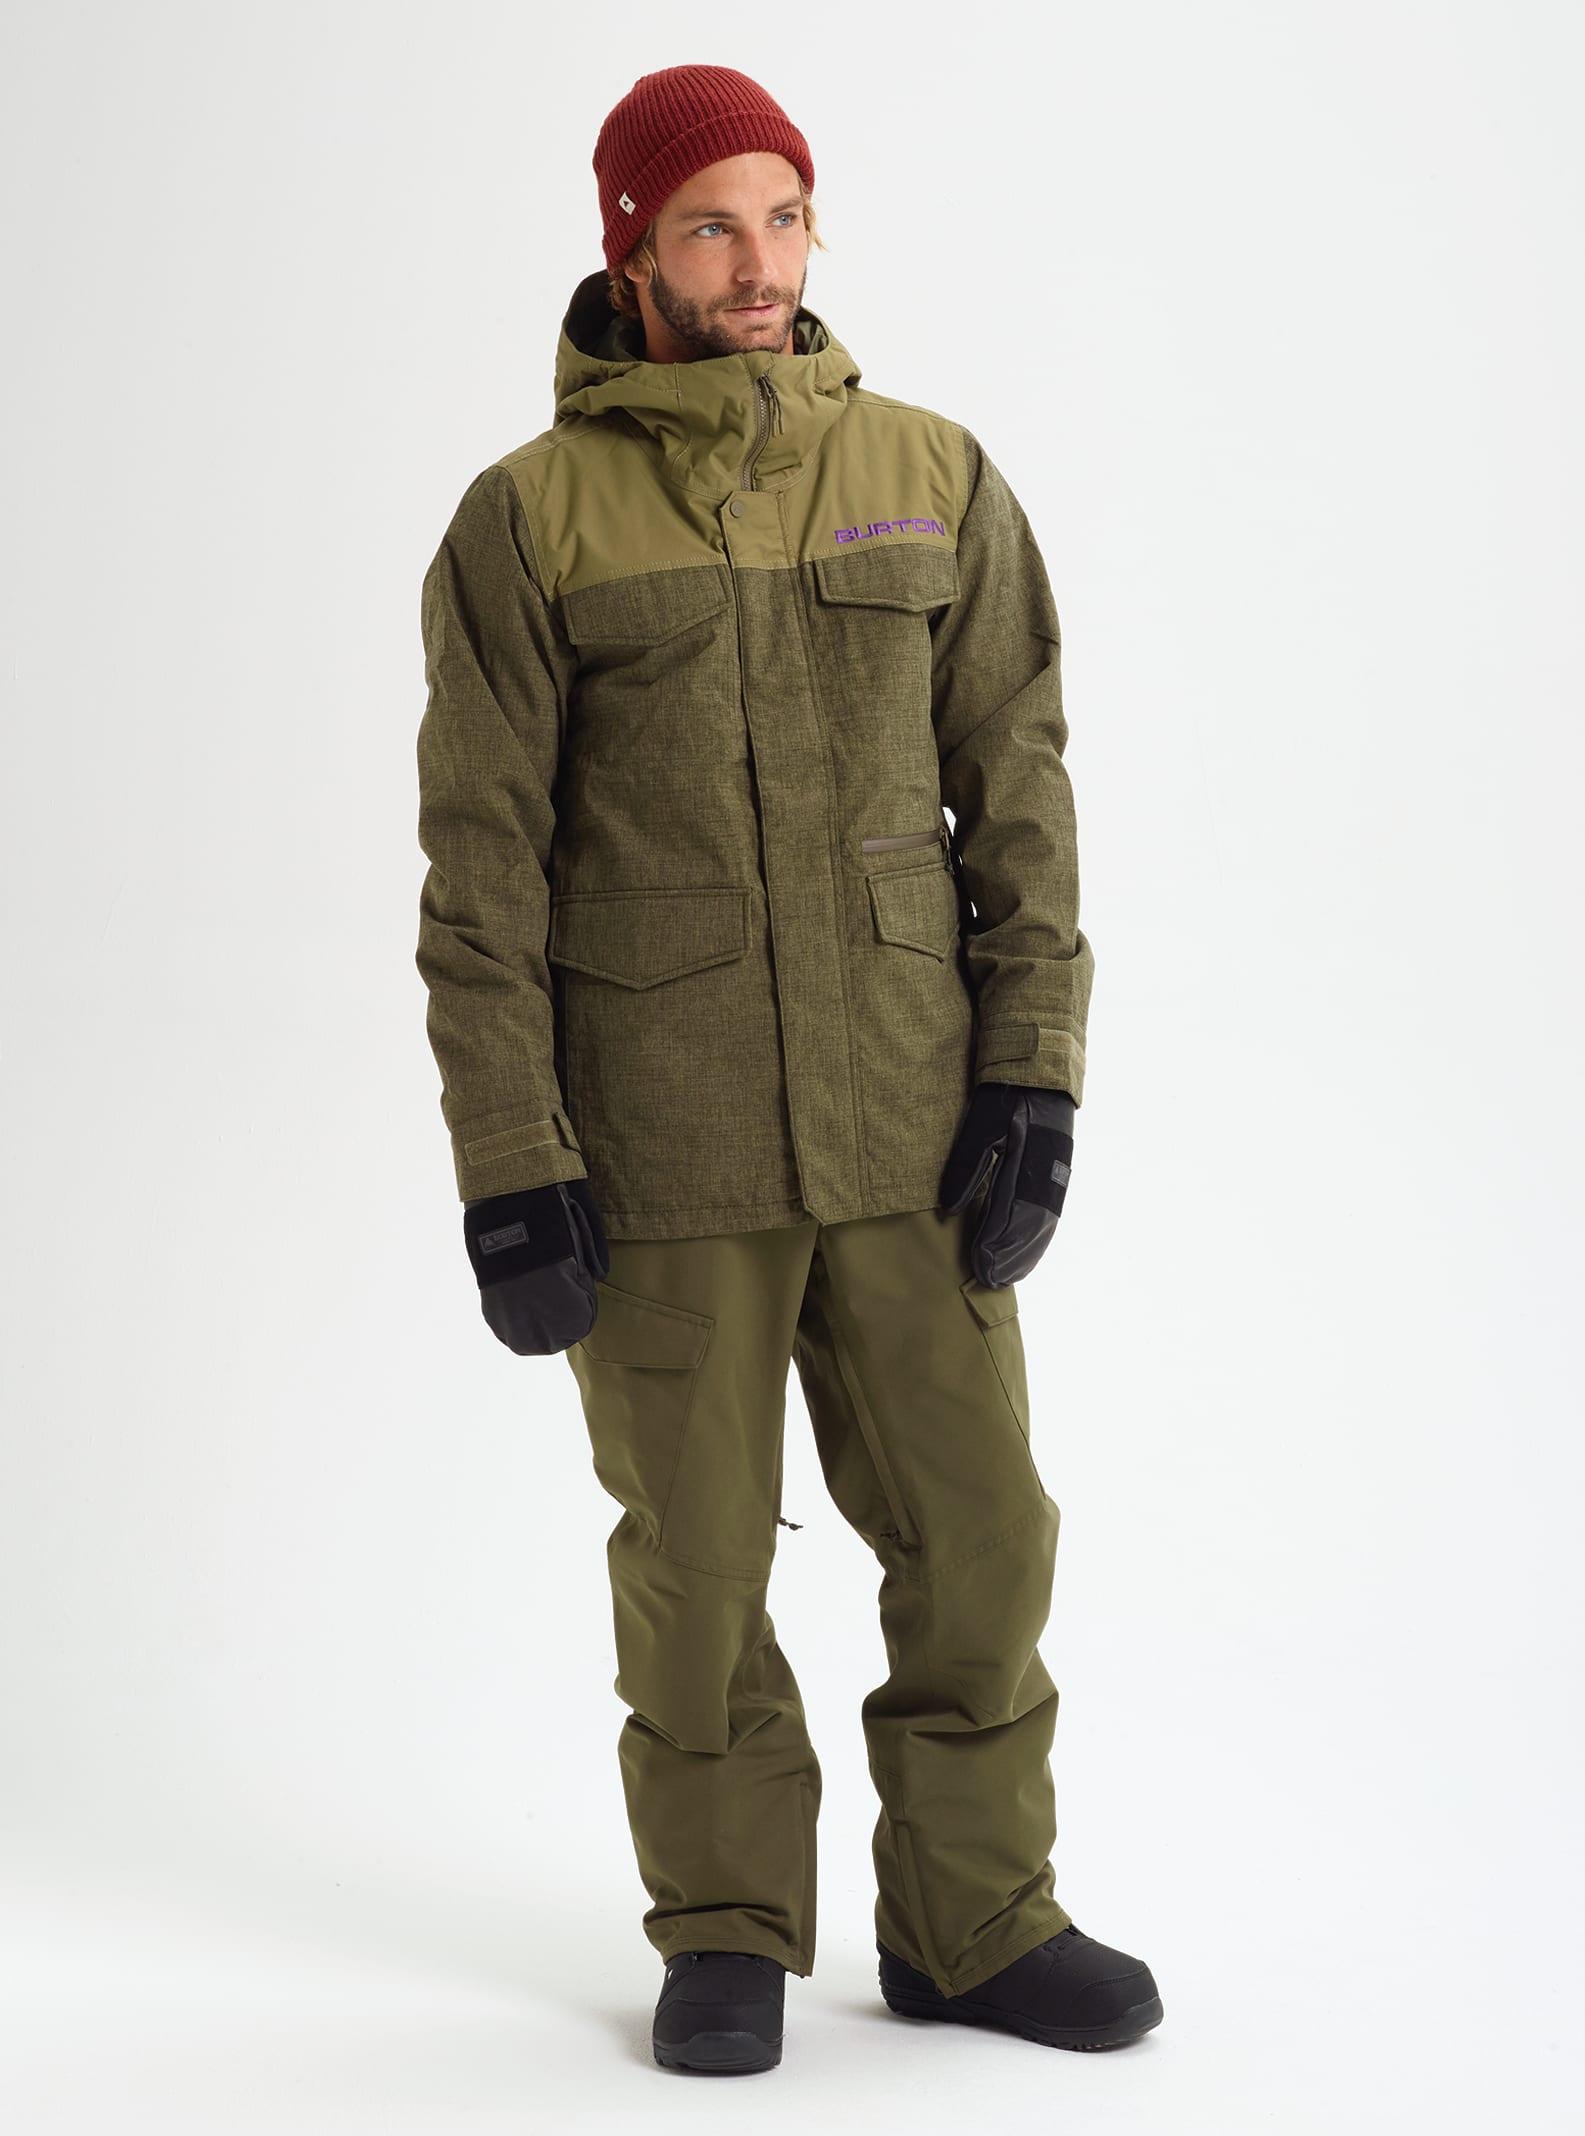 aaf489bcc Men's Snowboard Jackets | Burton Snowboards